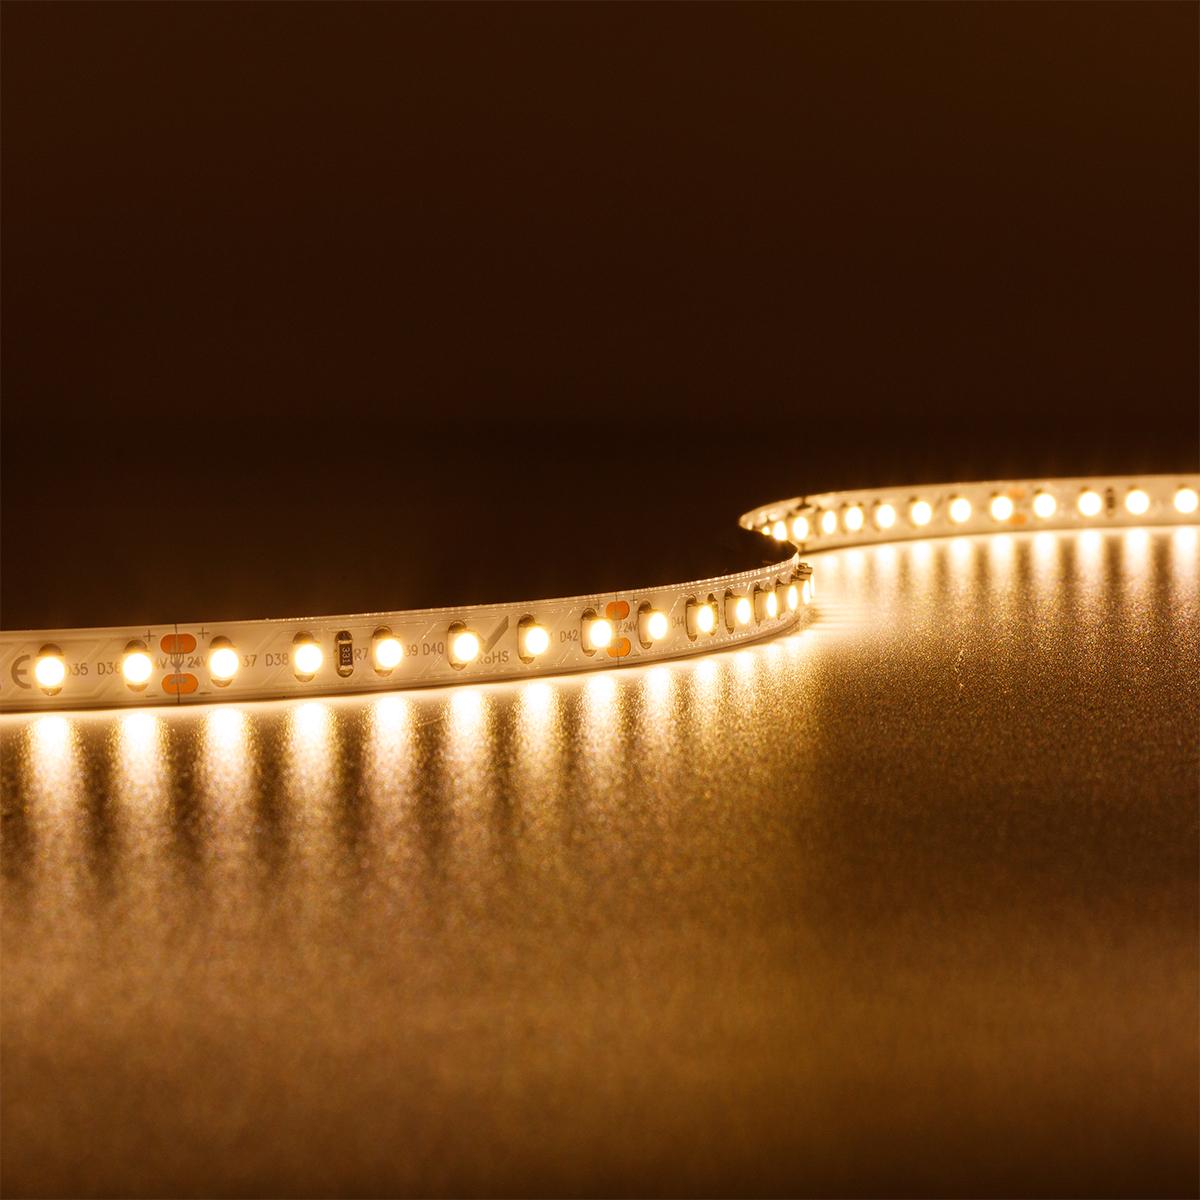 Strip Warmweiß 24V LED Streifen 5M 9,6W/m 120LED/m 8mm IP20 3000K